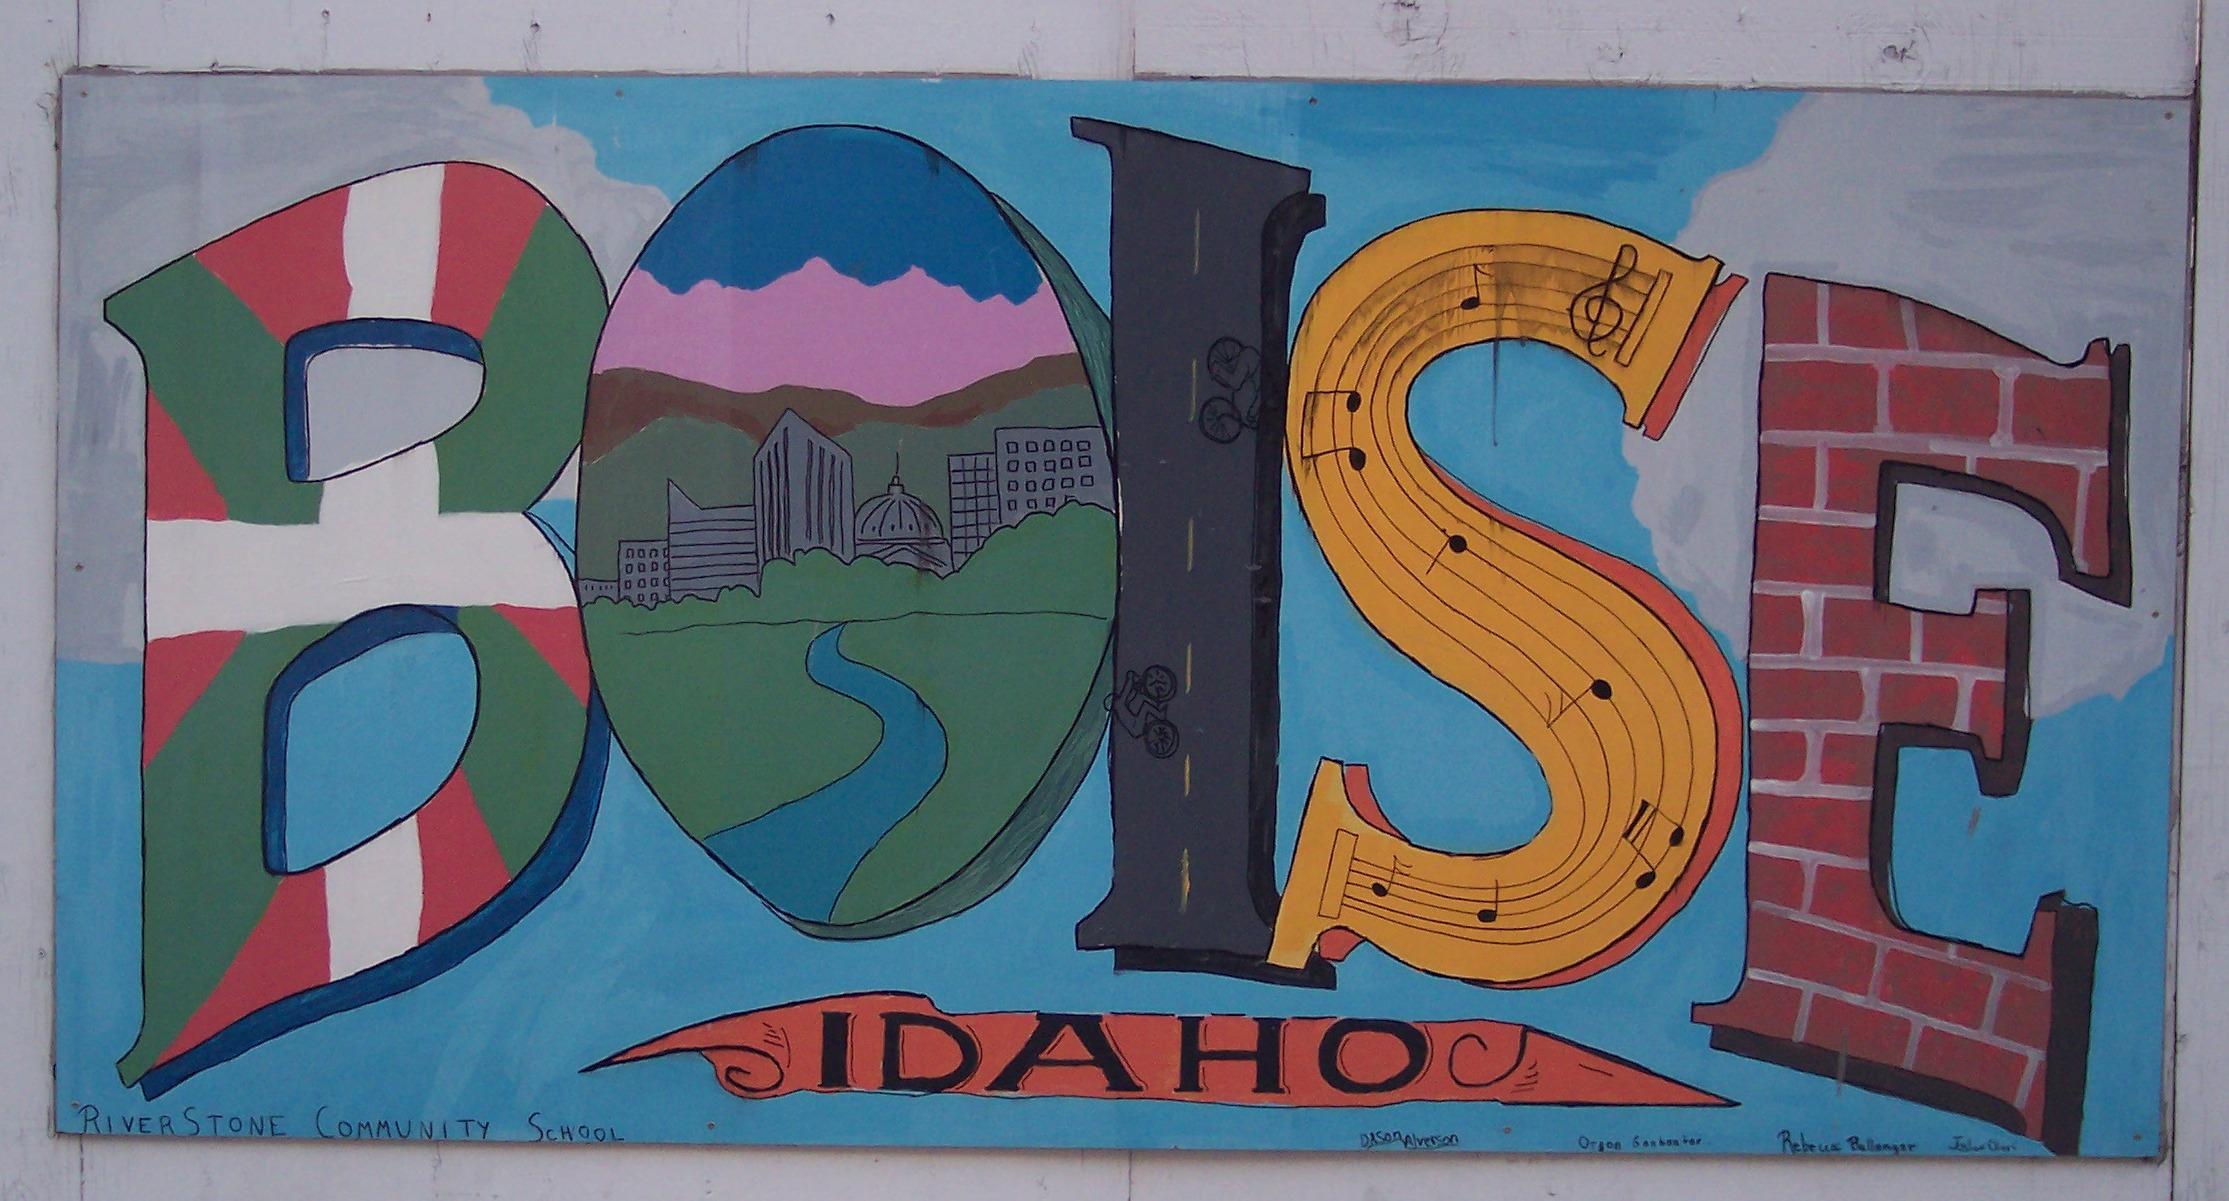 Boise_sign